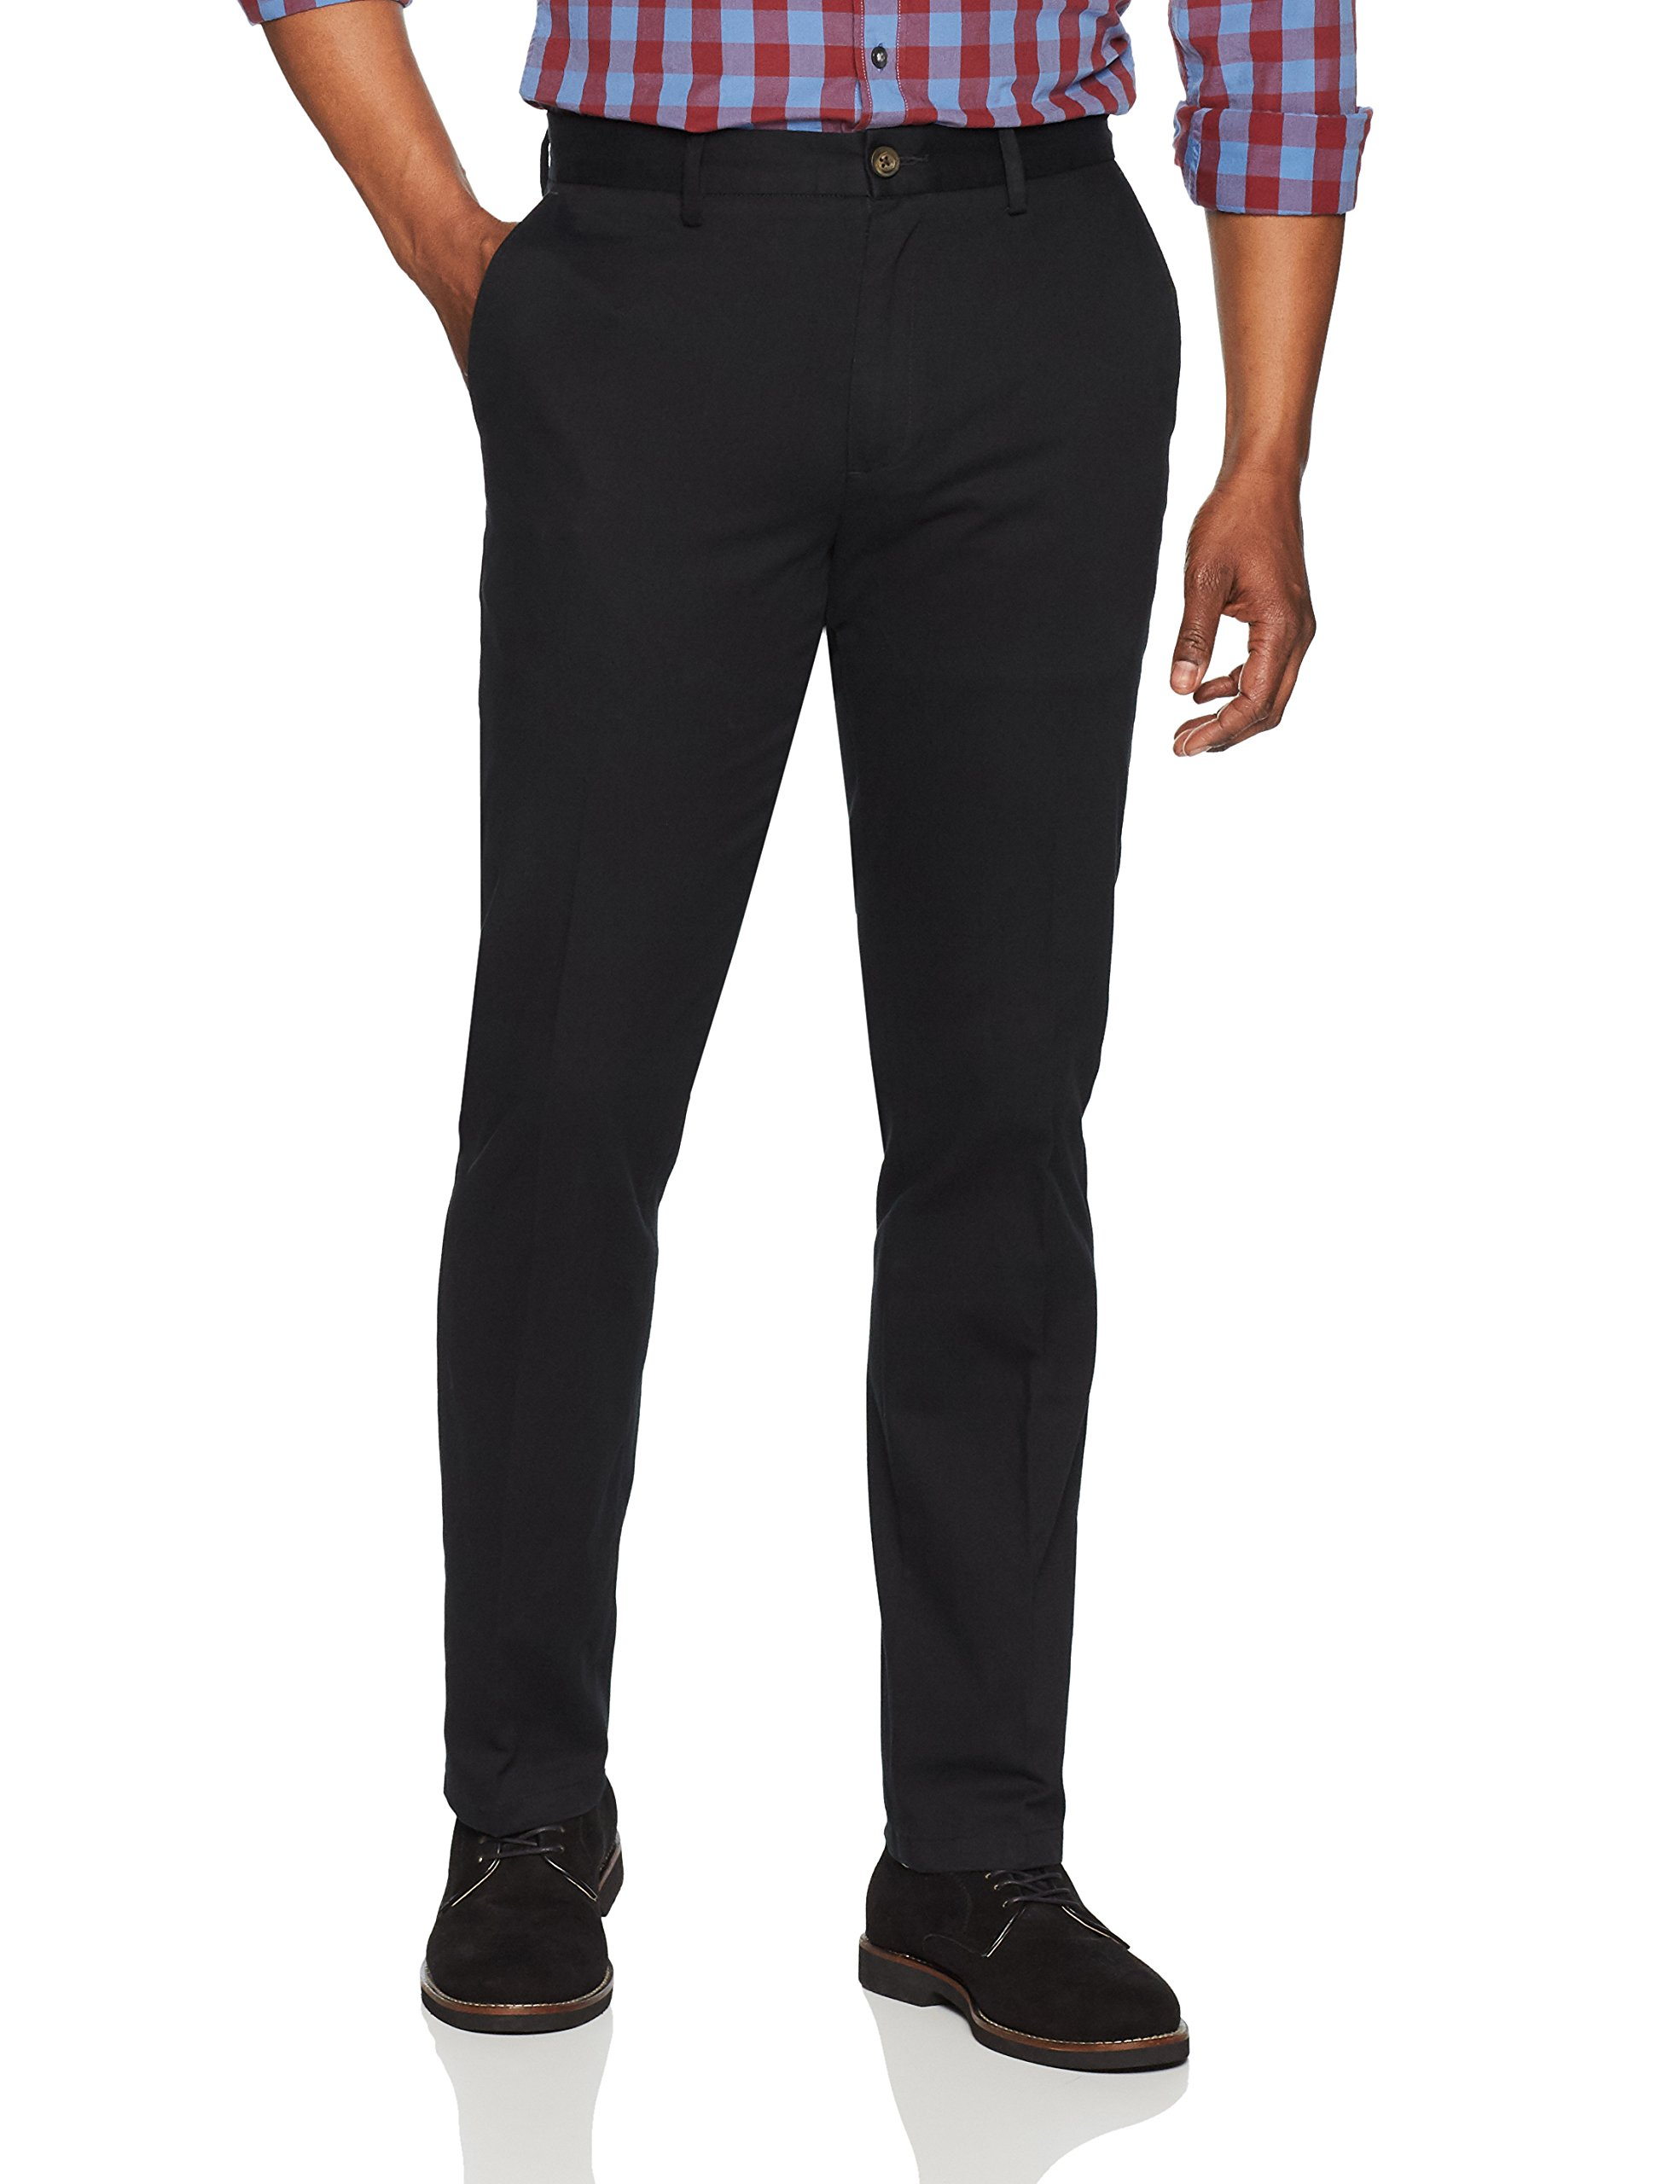 Amazon Essentials Men's Slim-Fit Wrinkle-Resistant Flat-Front Chino Pant, Black, 32W x 32L